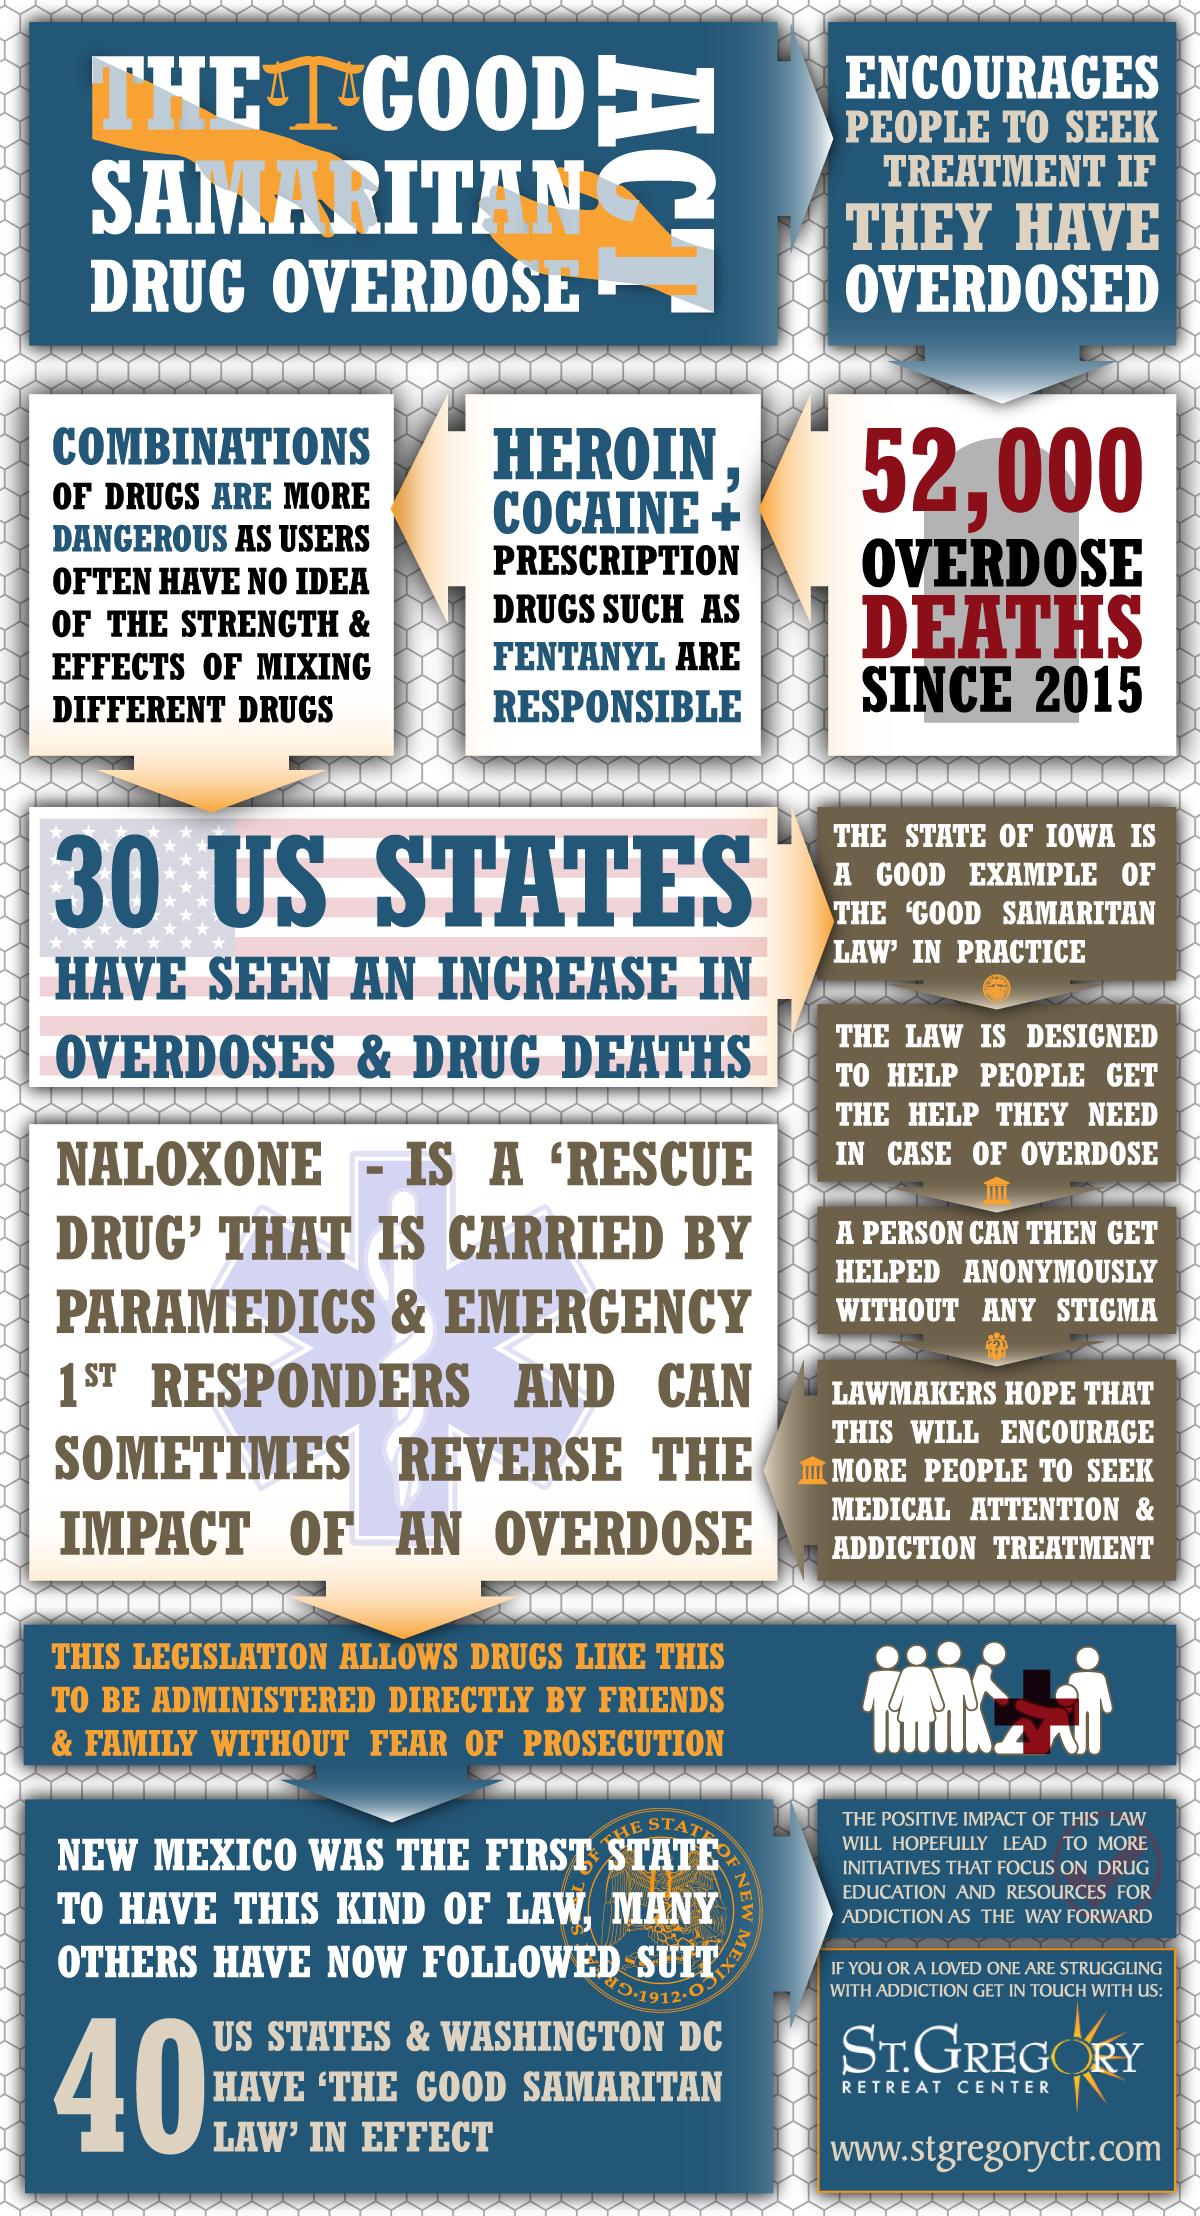 Good Samaritan Drug Overdose Act